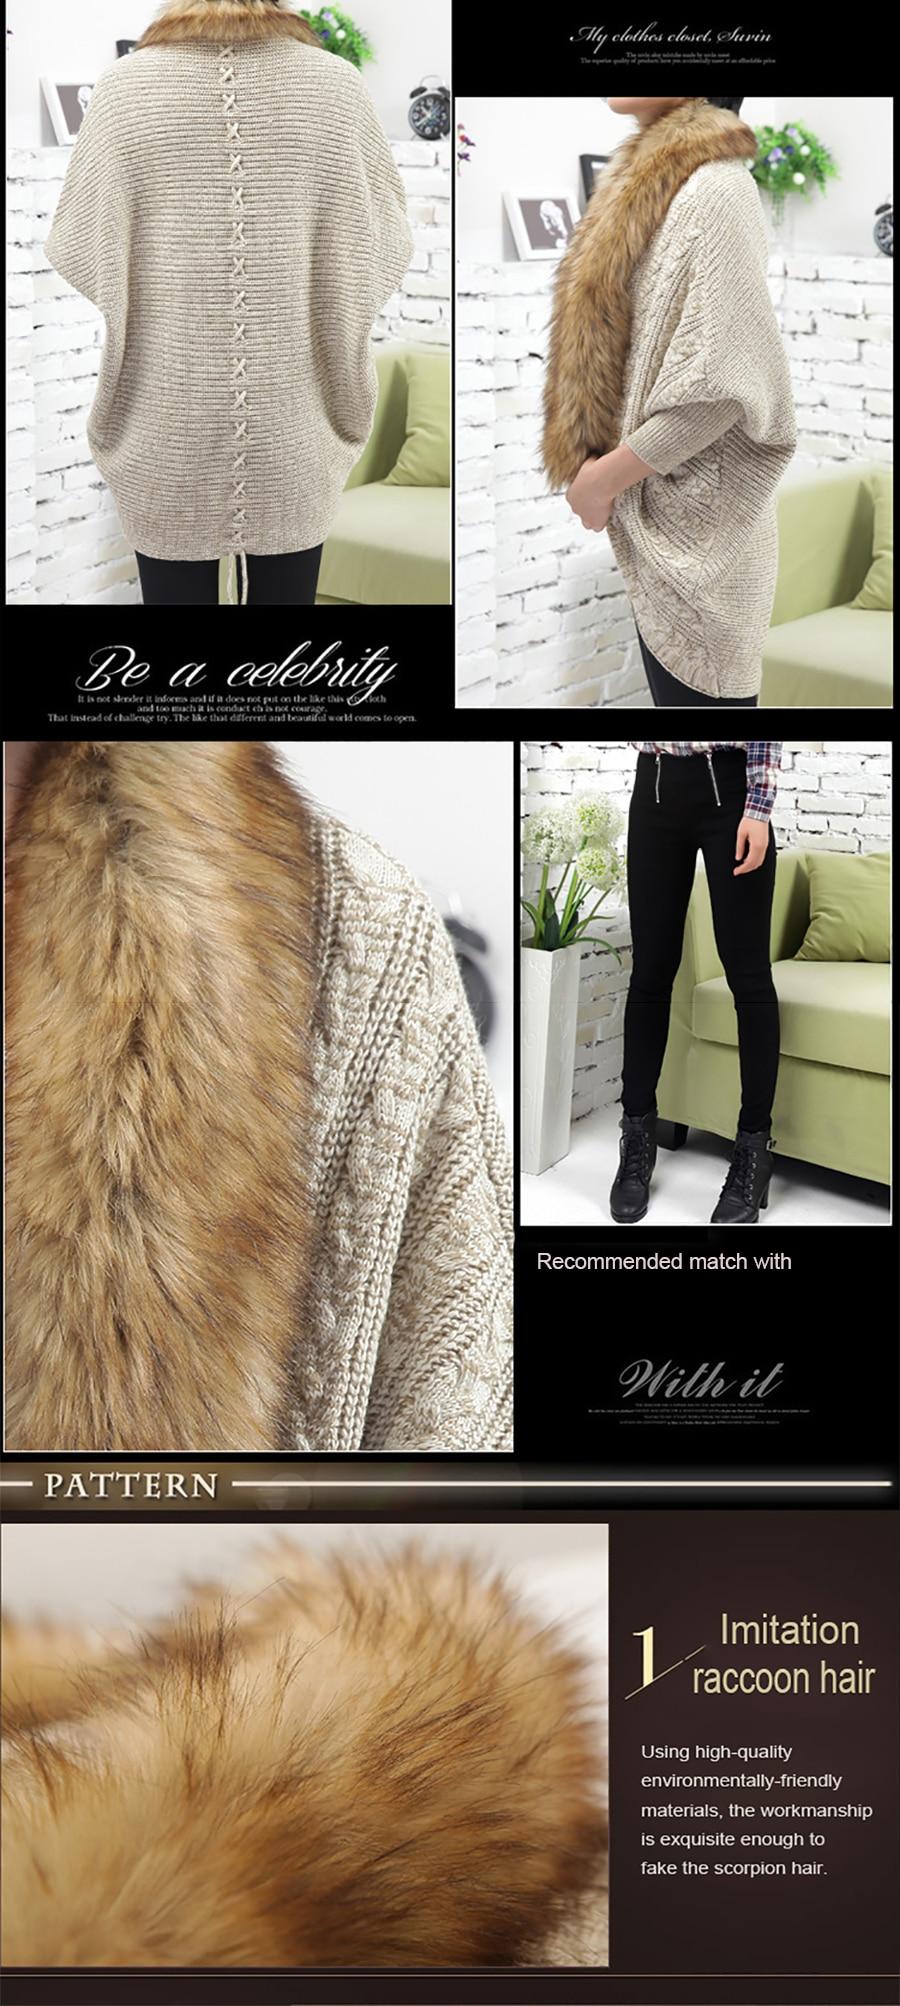 Hot Women Fur Collar Cardigan Imitation Raccoon Hair Female Sweater Rear Drawstring Design V-Neck Batwing Sleeve Winter Outwear (8)